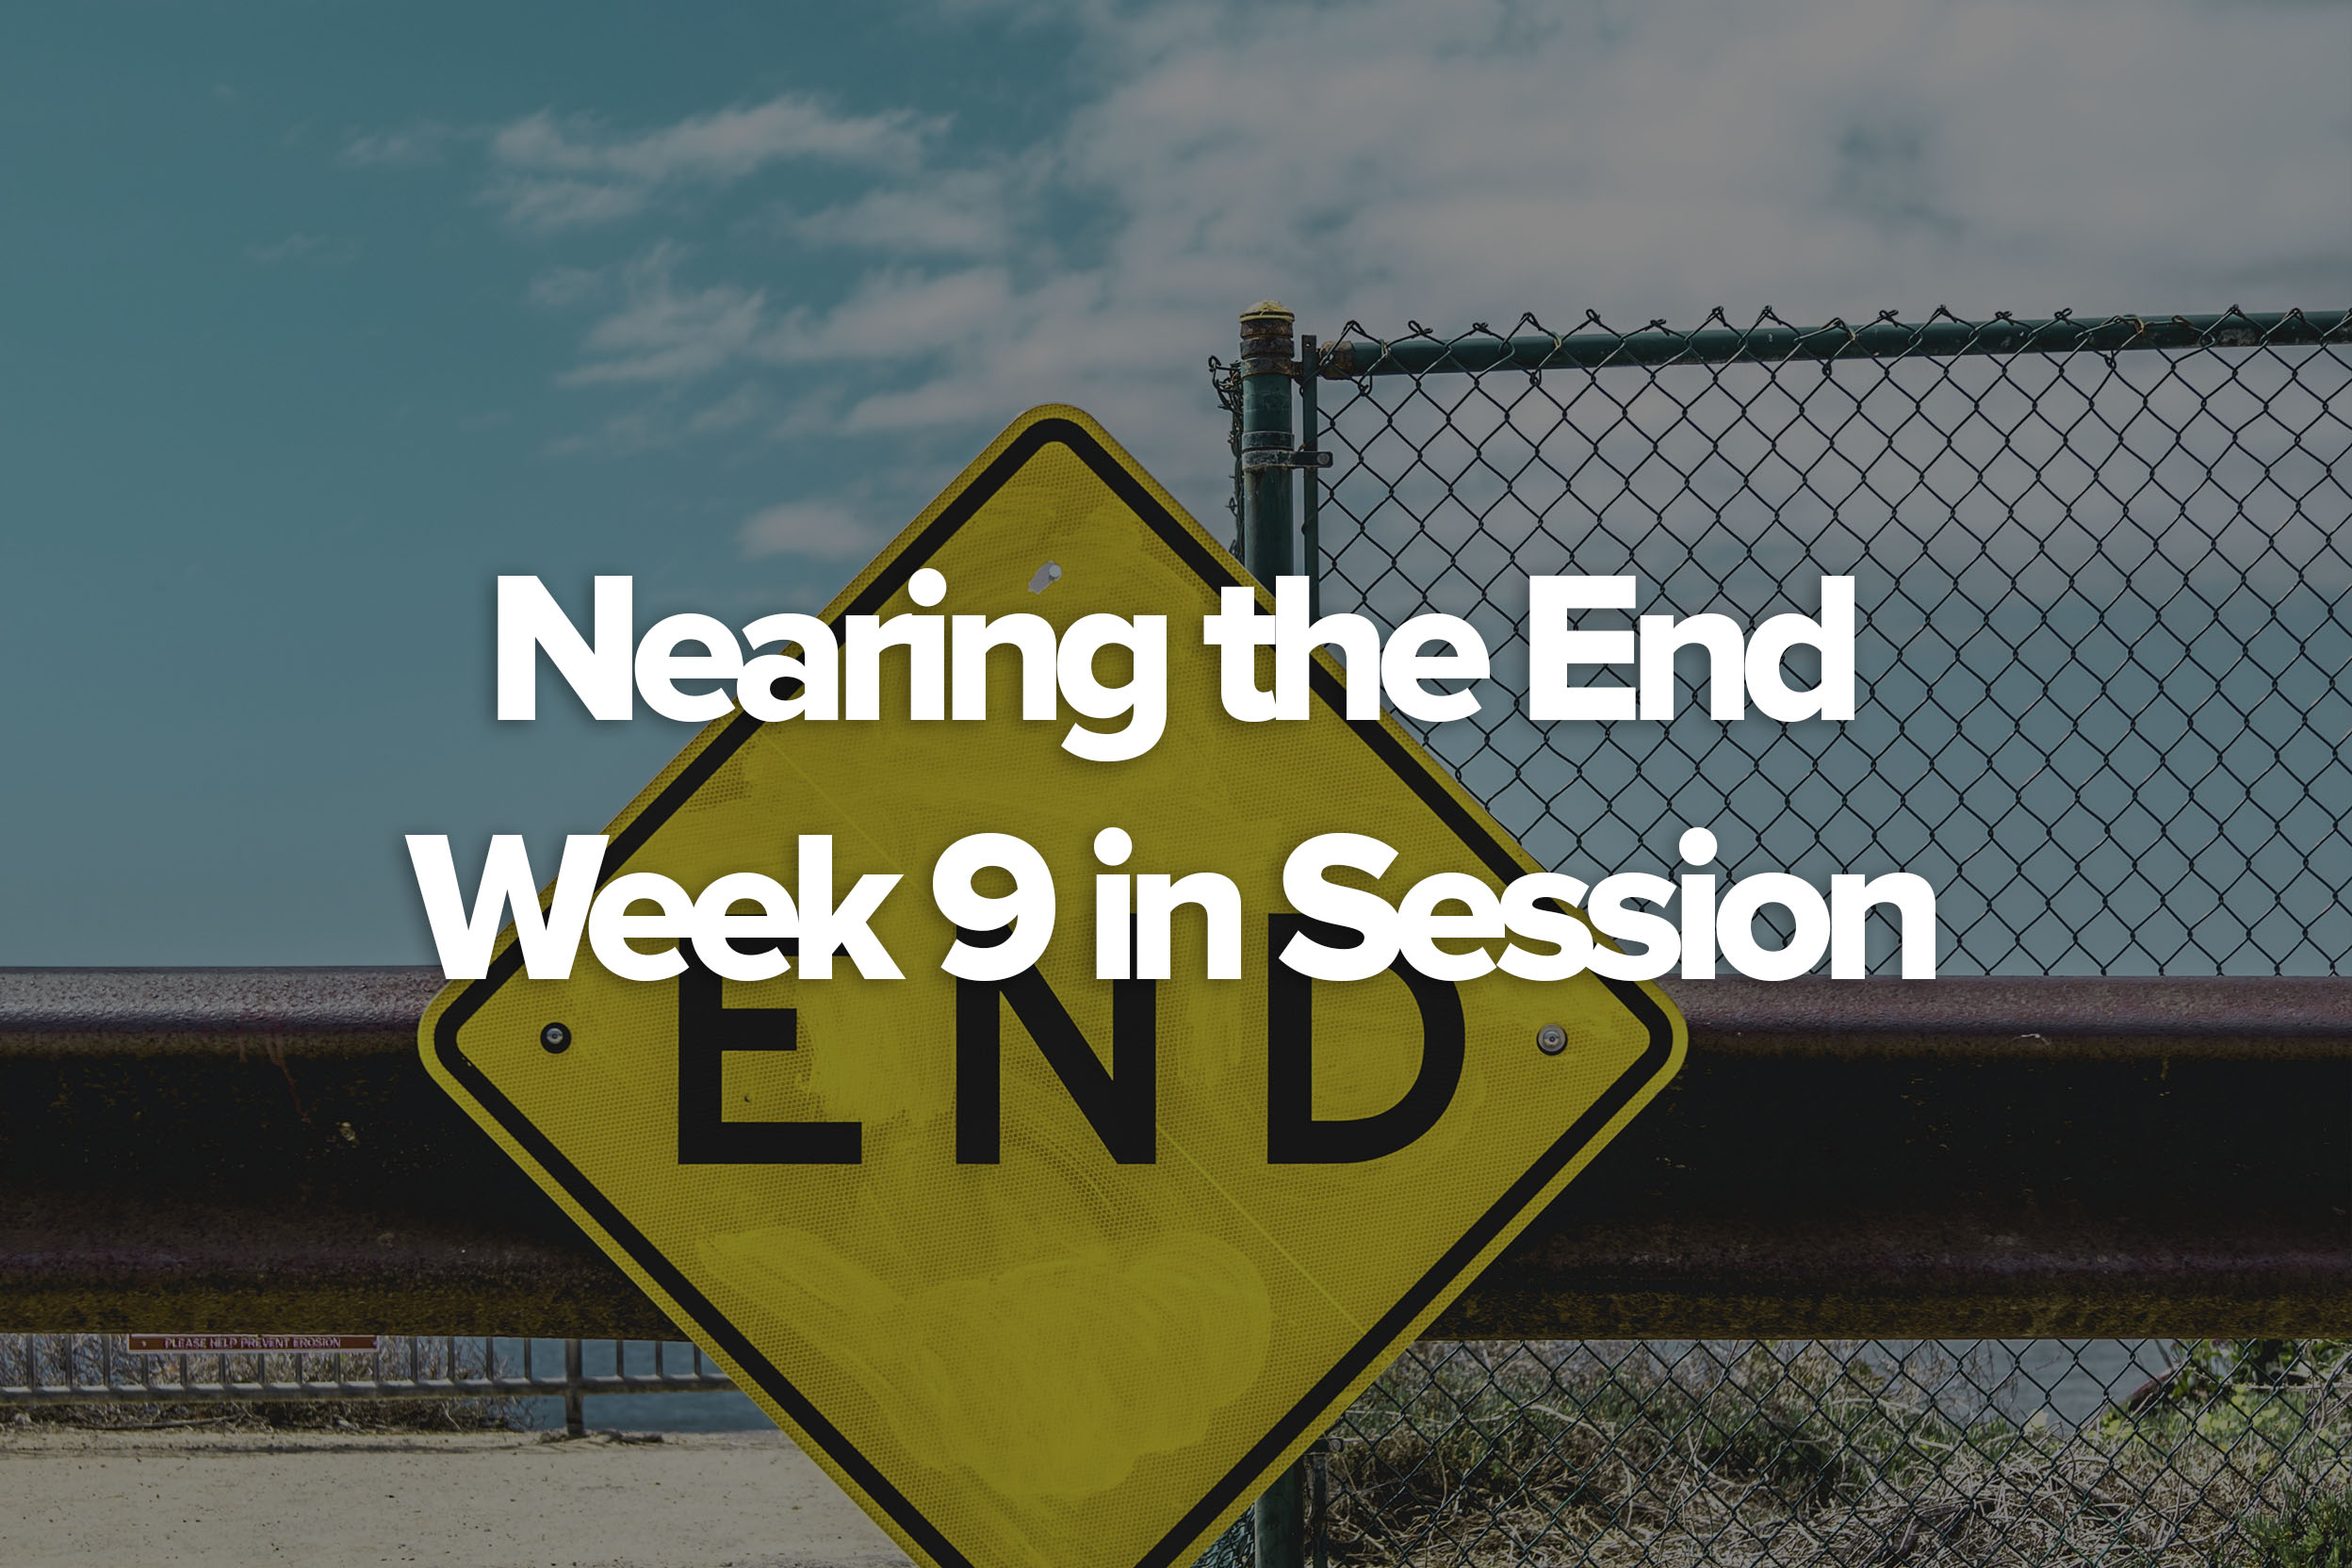 week 9 nearing the end.jpg